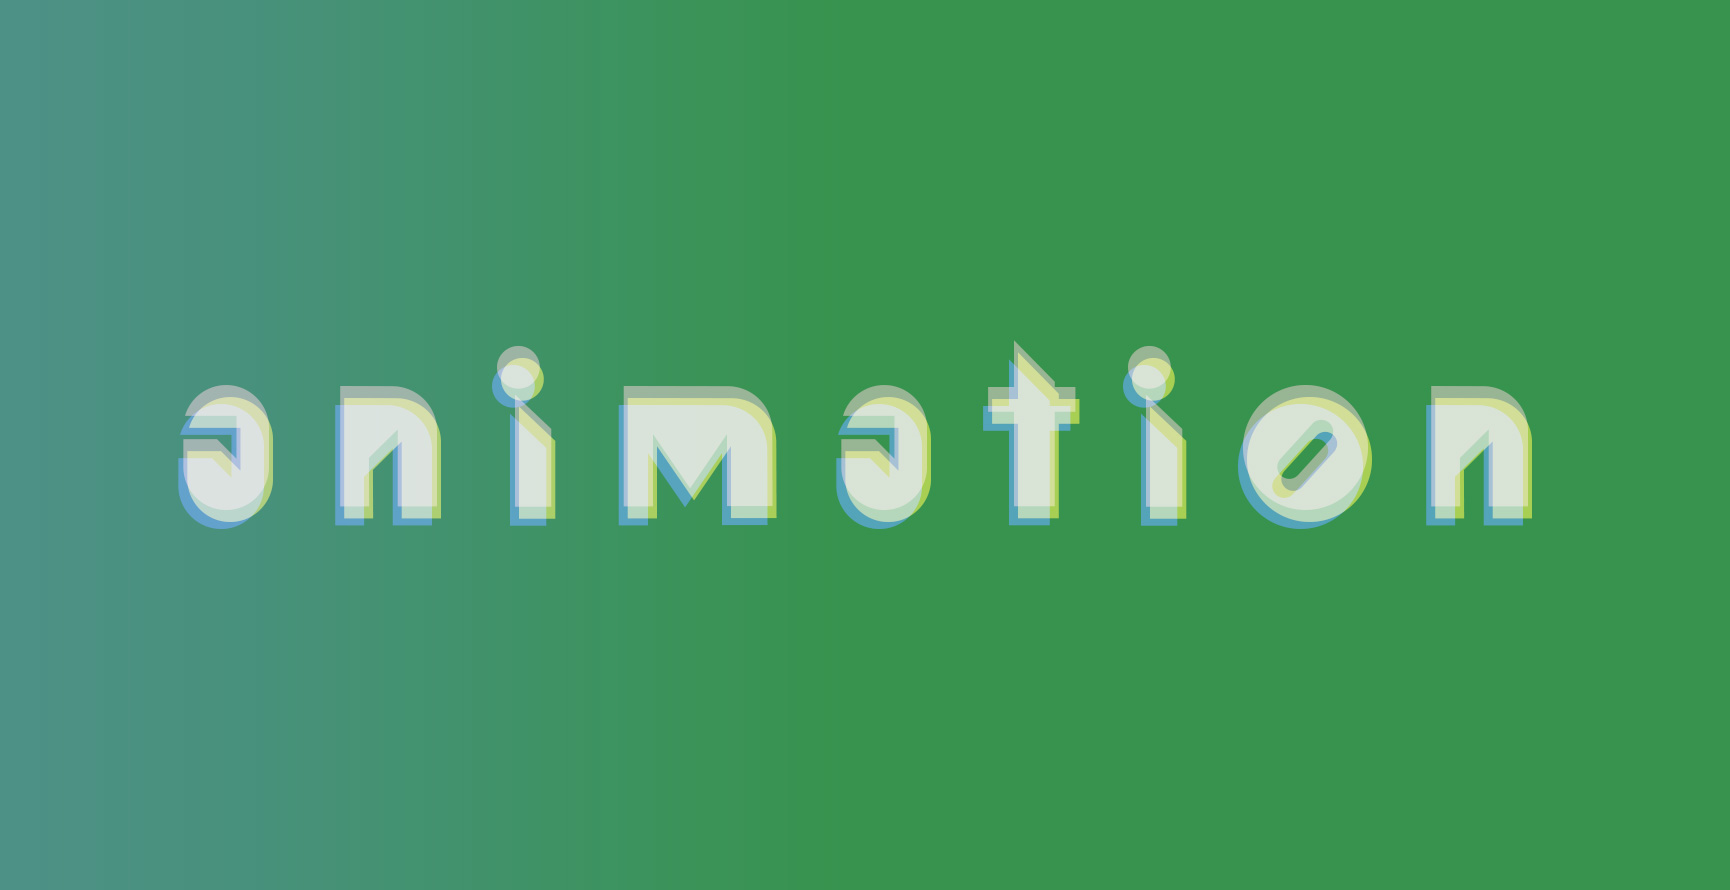 Adobe XDの自動アニメーションを使いこなして動きのあるプロトタイプを作ろう!